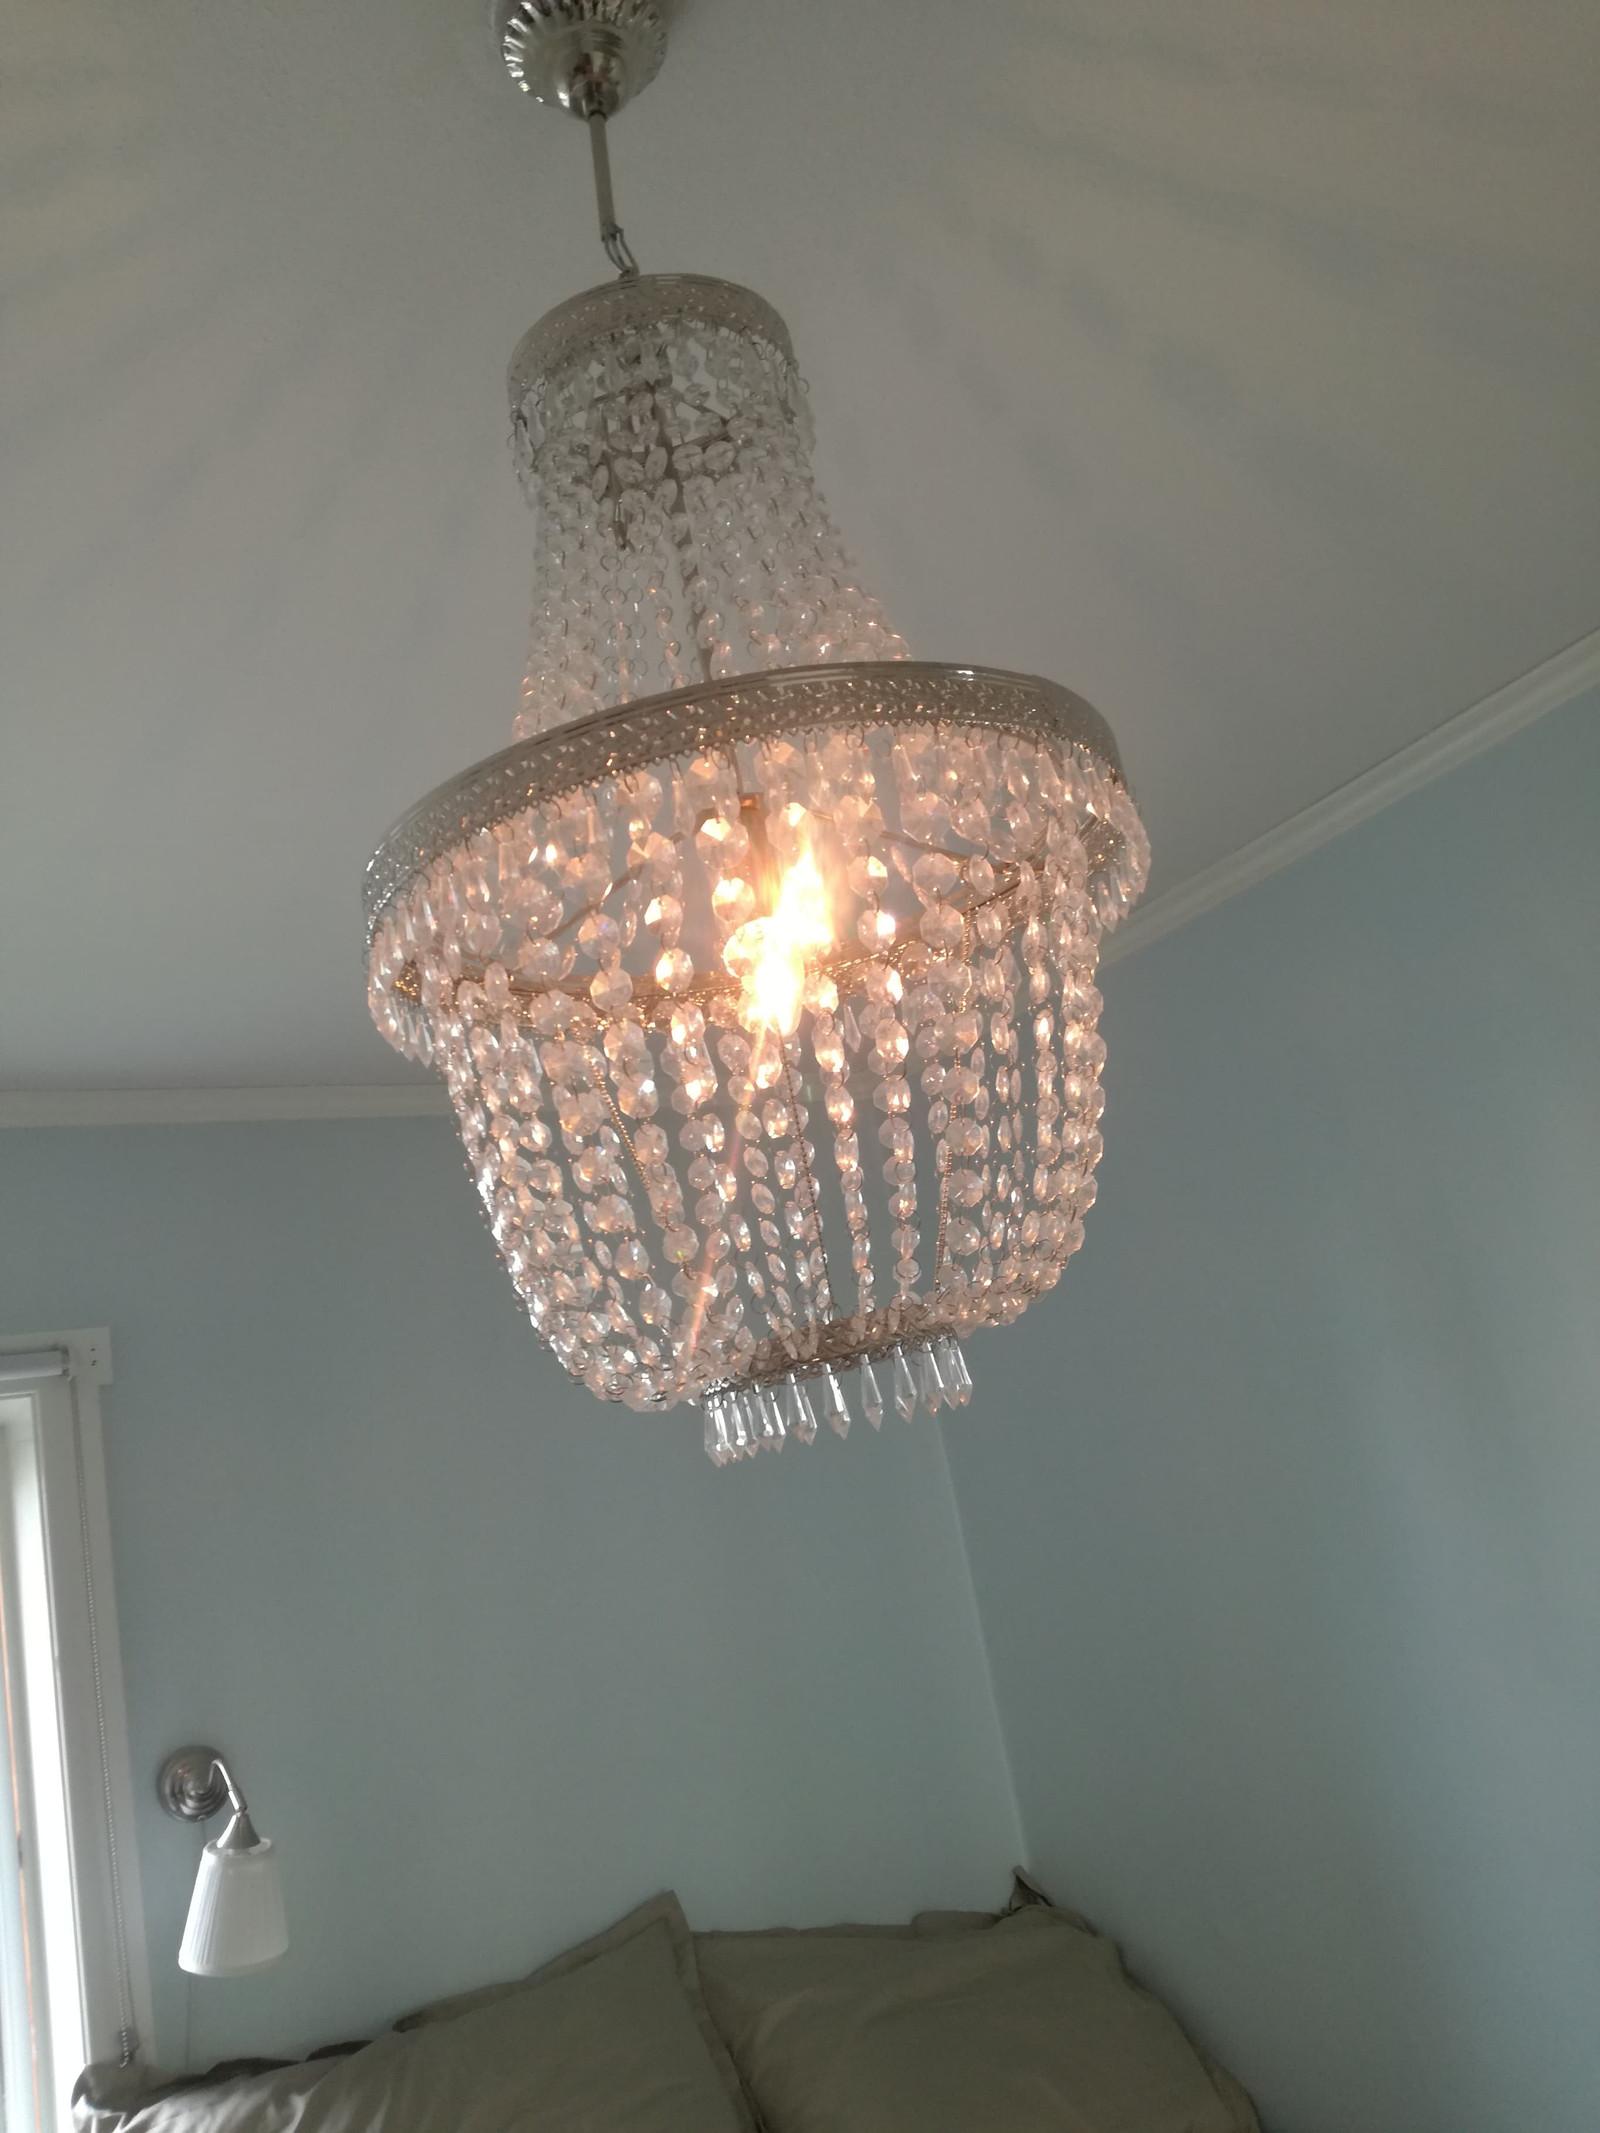 Orientalske lamper 3 stk og dekorative bokser i tre | FINN.no